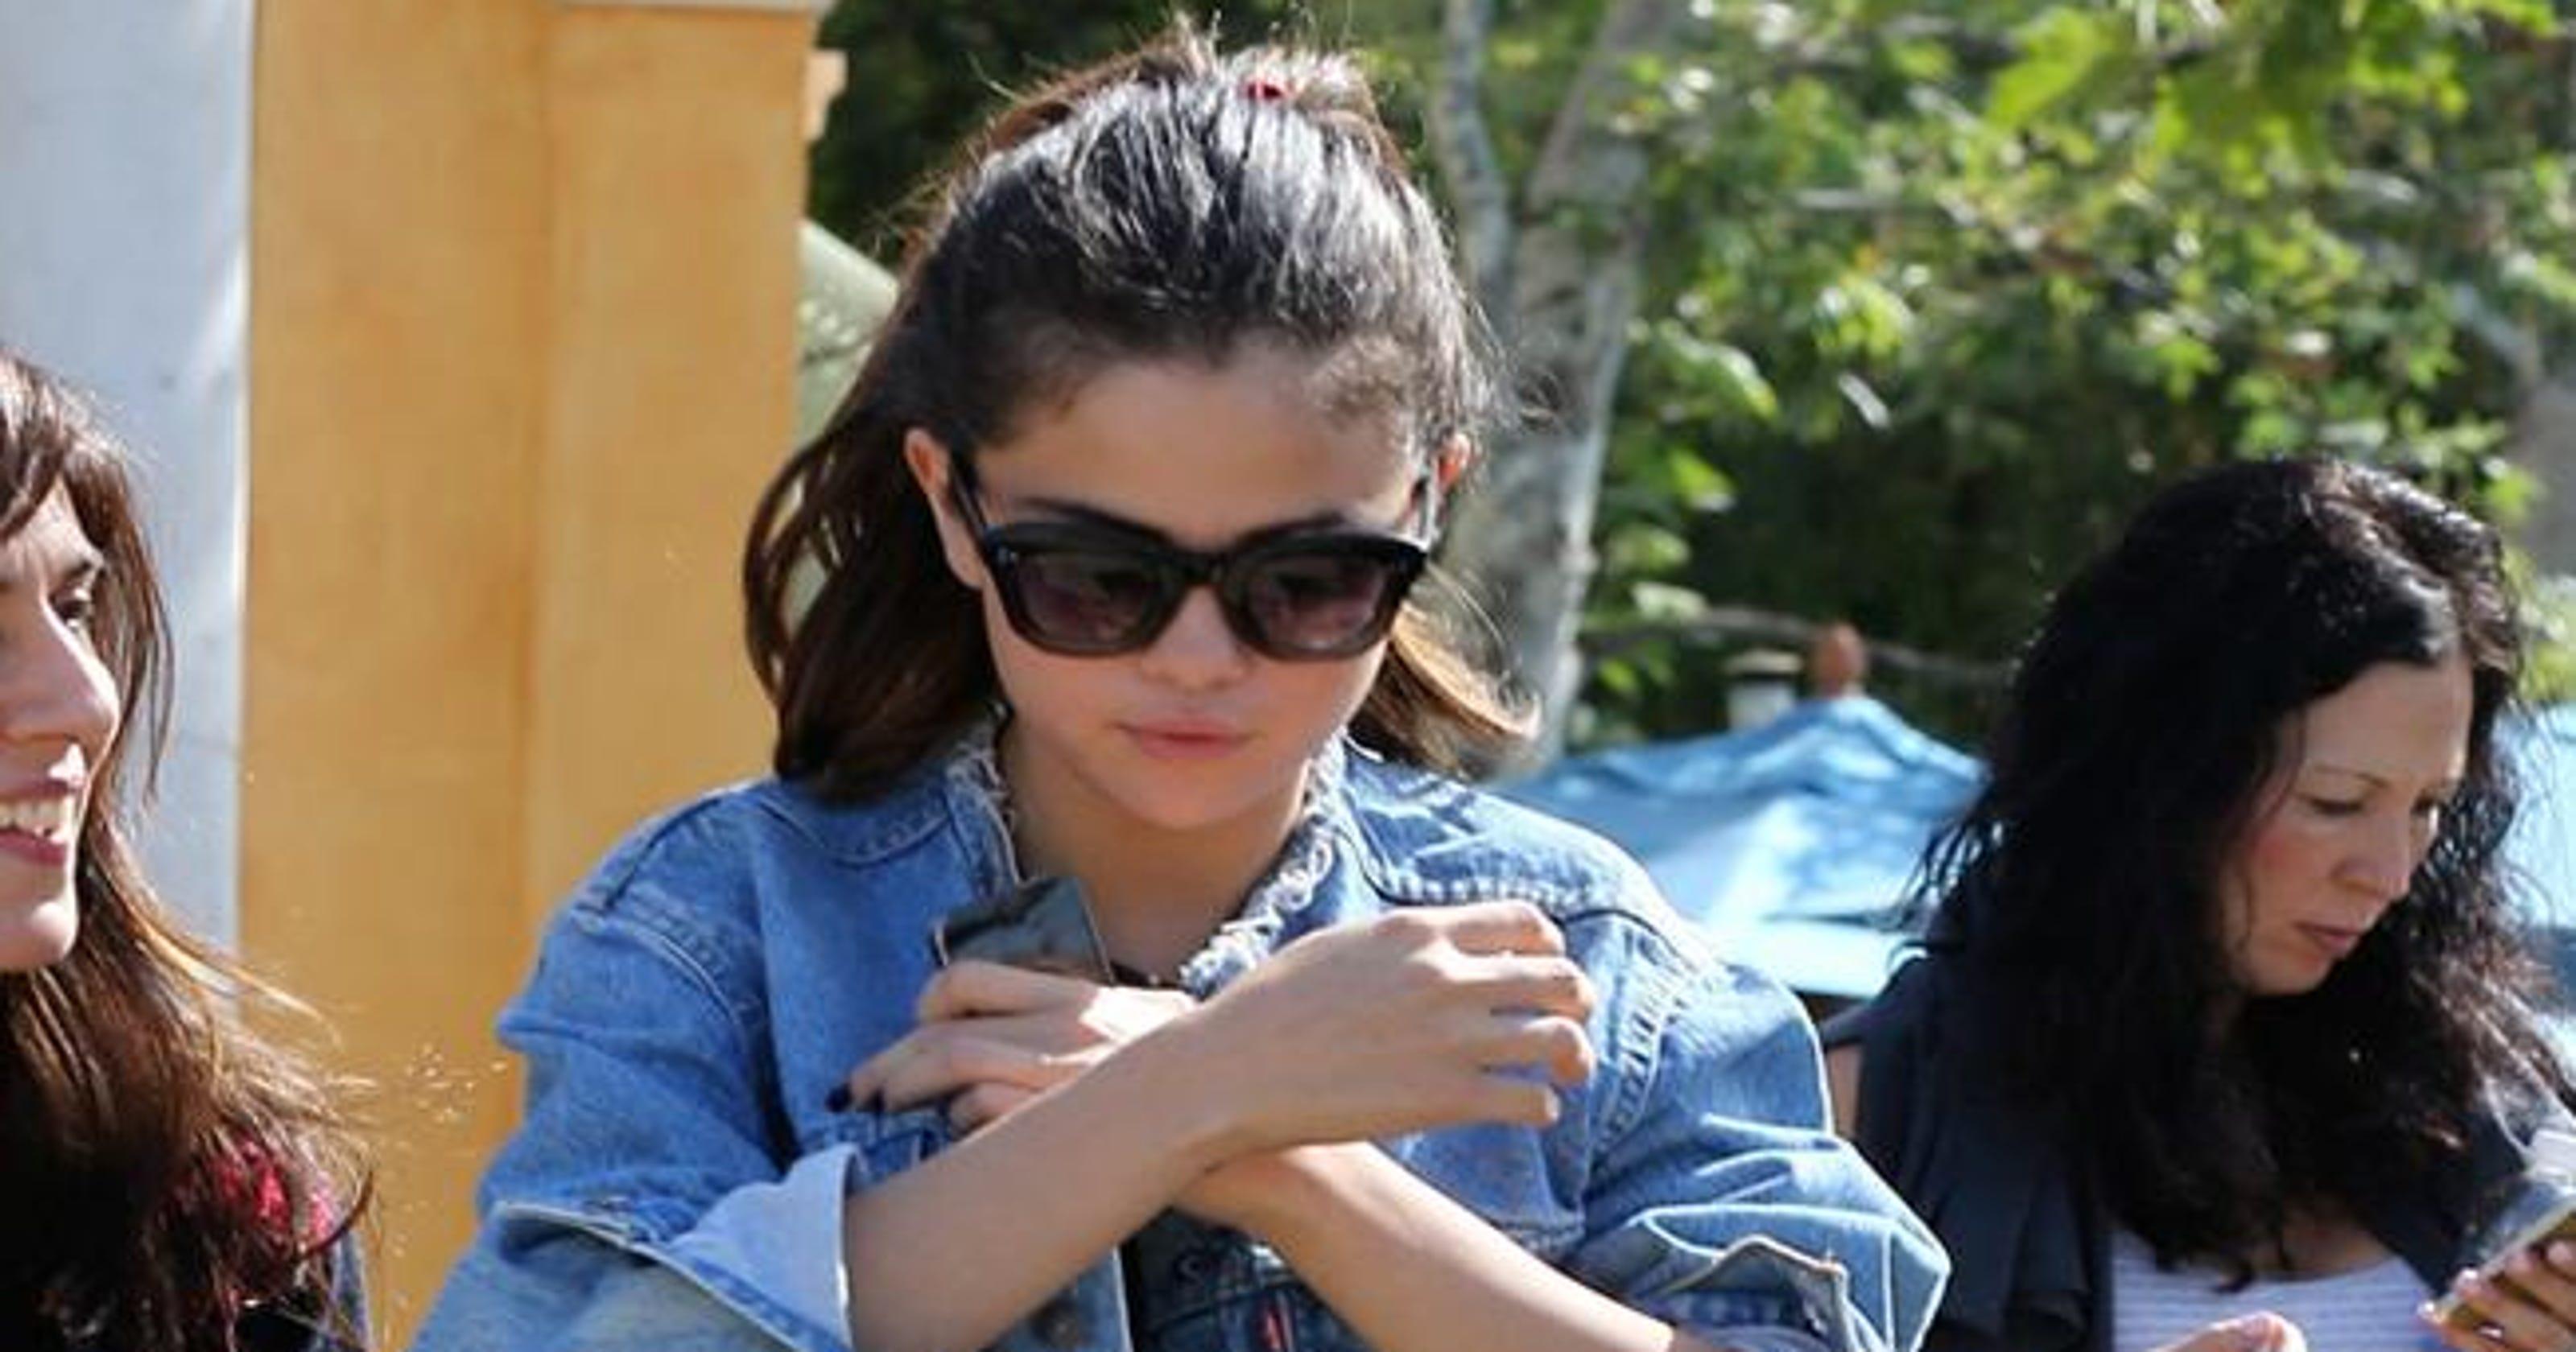 f69f398208 Selena Gomez s grandfather says she has lupus